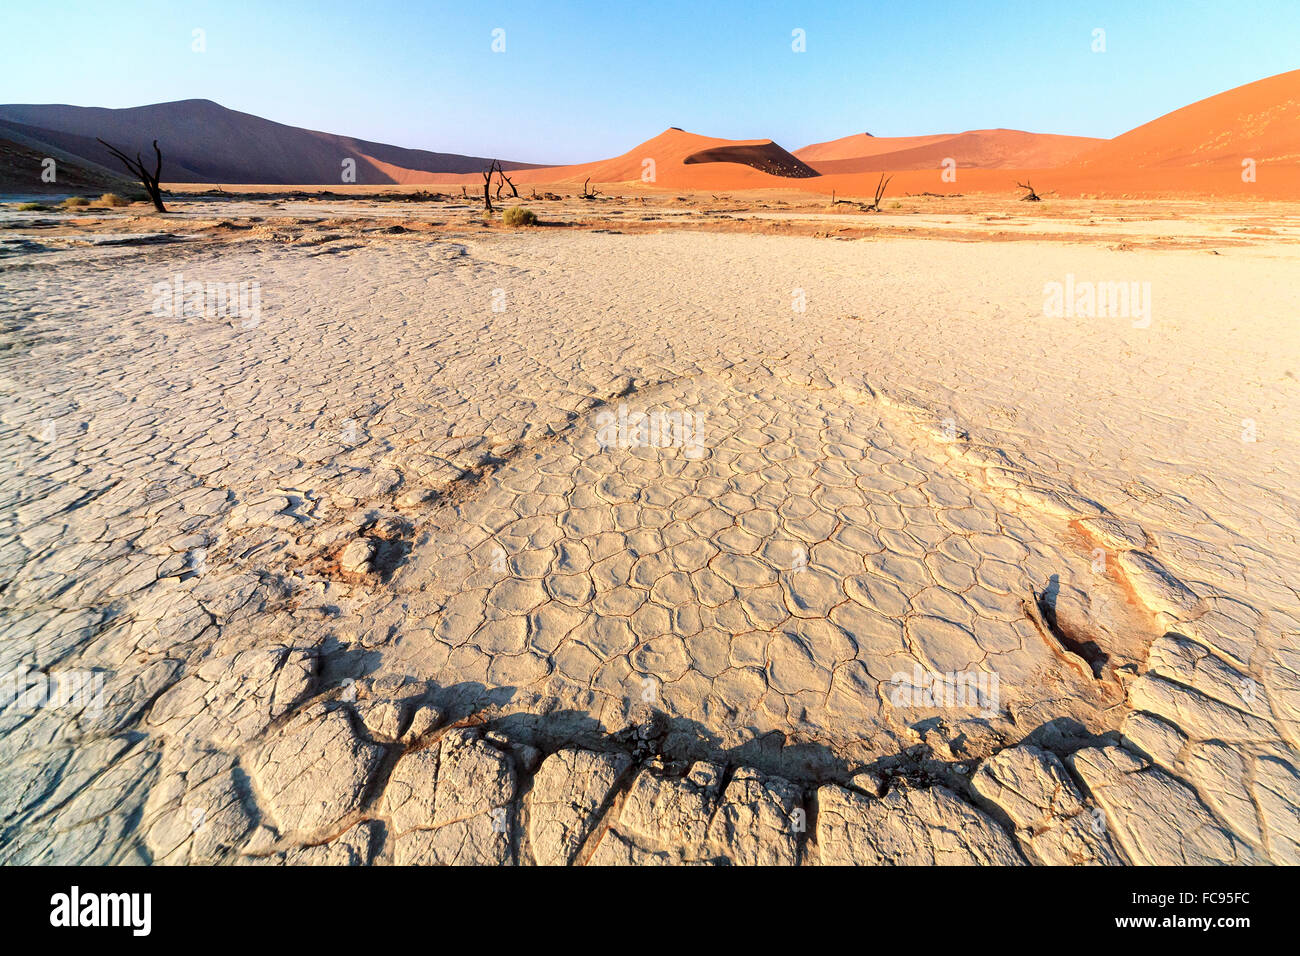 Parched ground and dead Acacia, Deadvlei, Sossusvlei, Namib Desert, Namib Naukluft National Park, Namibia - Stock Image